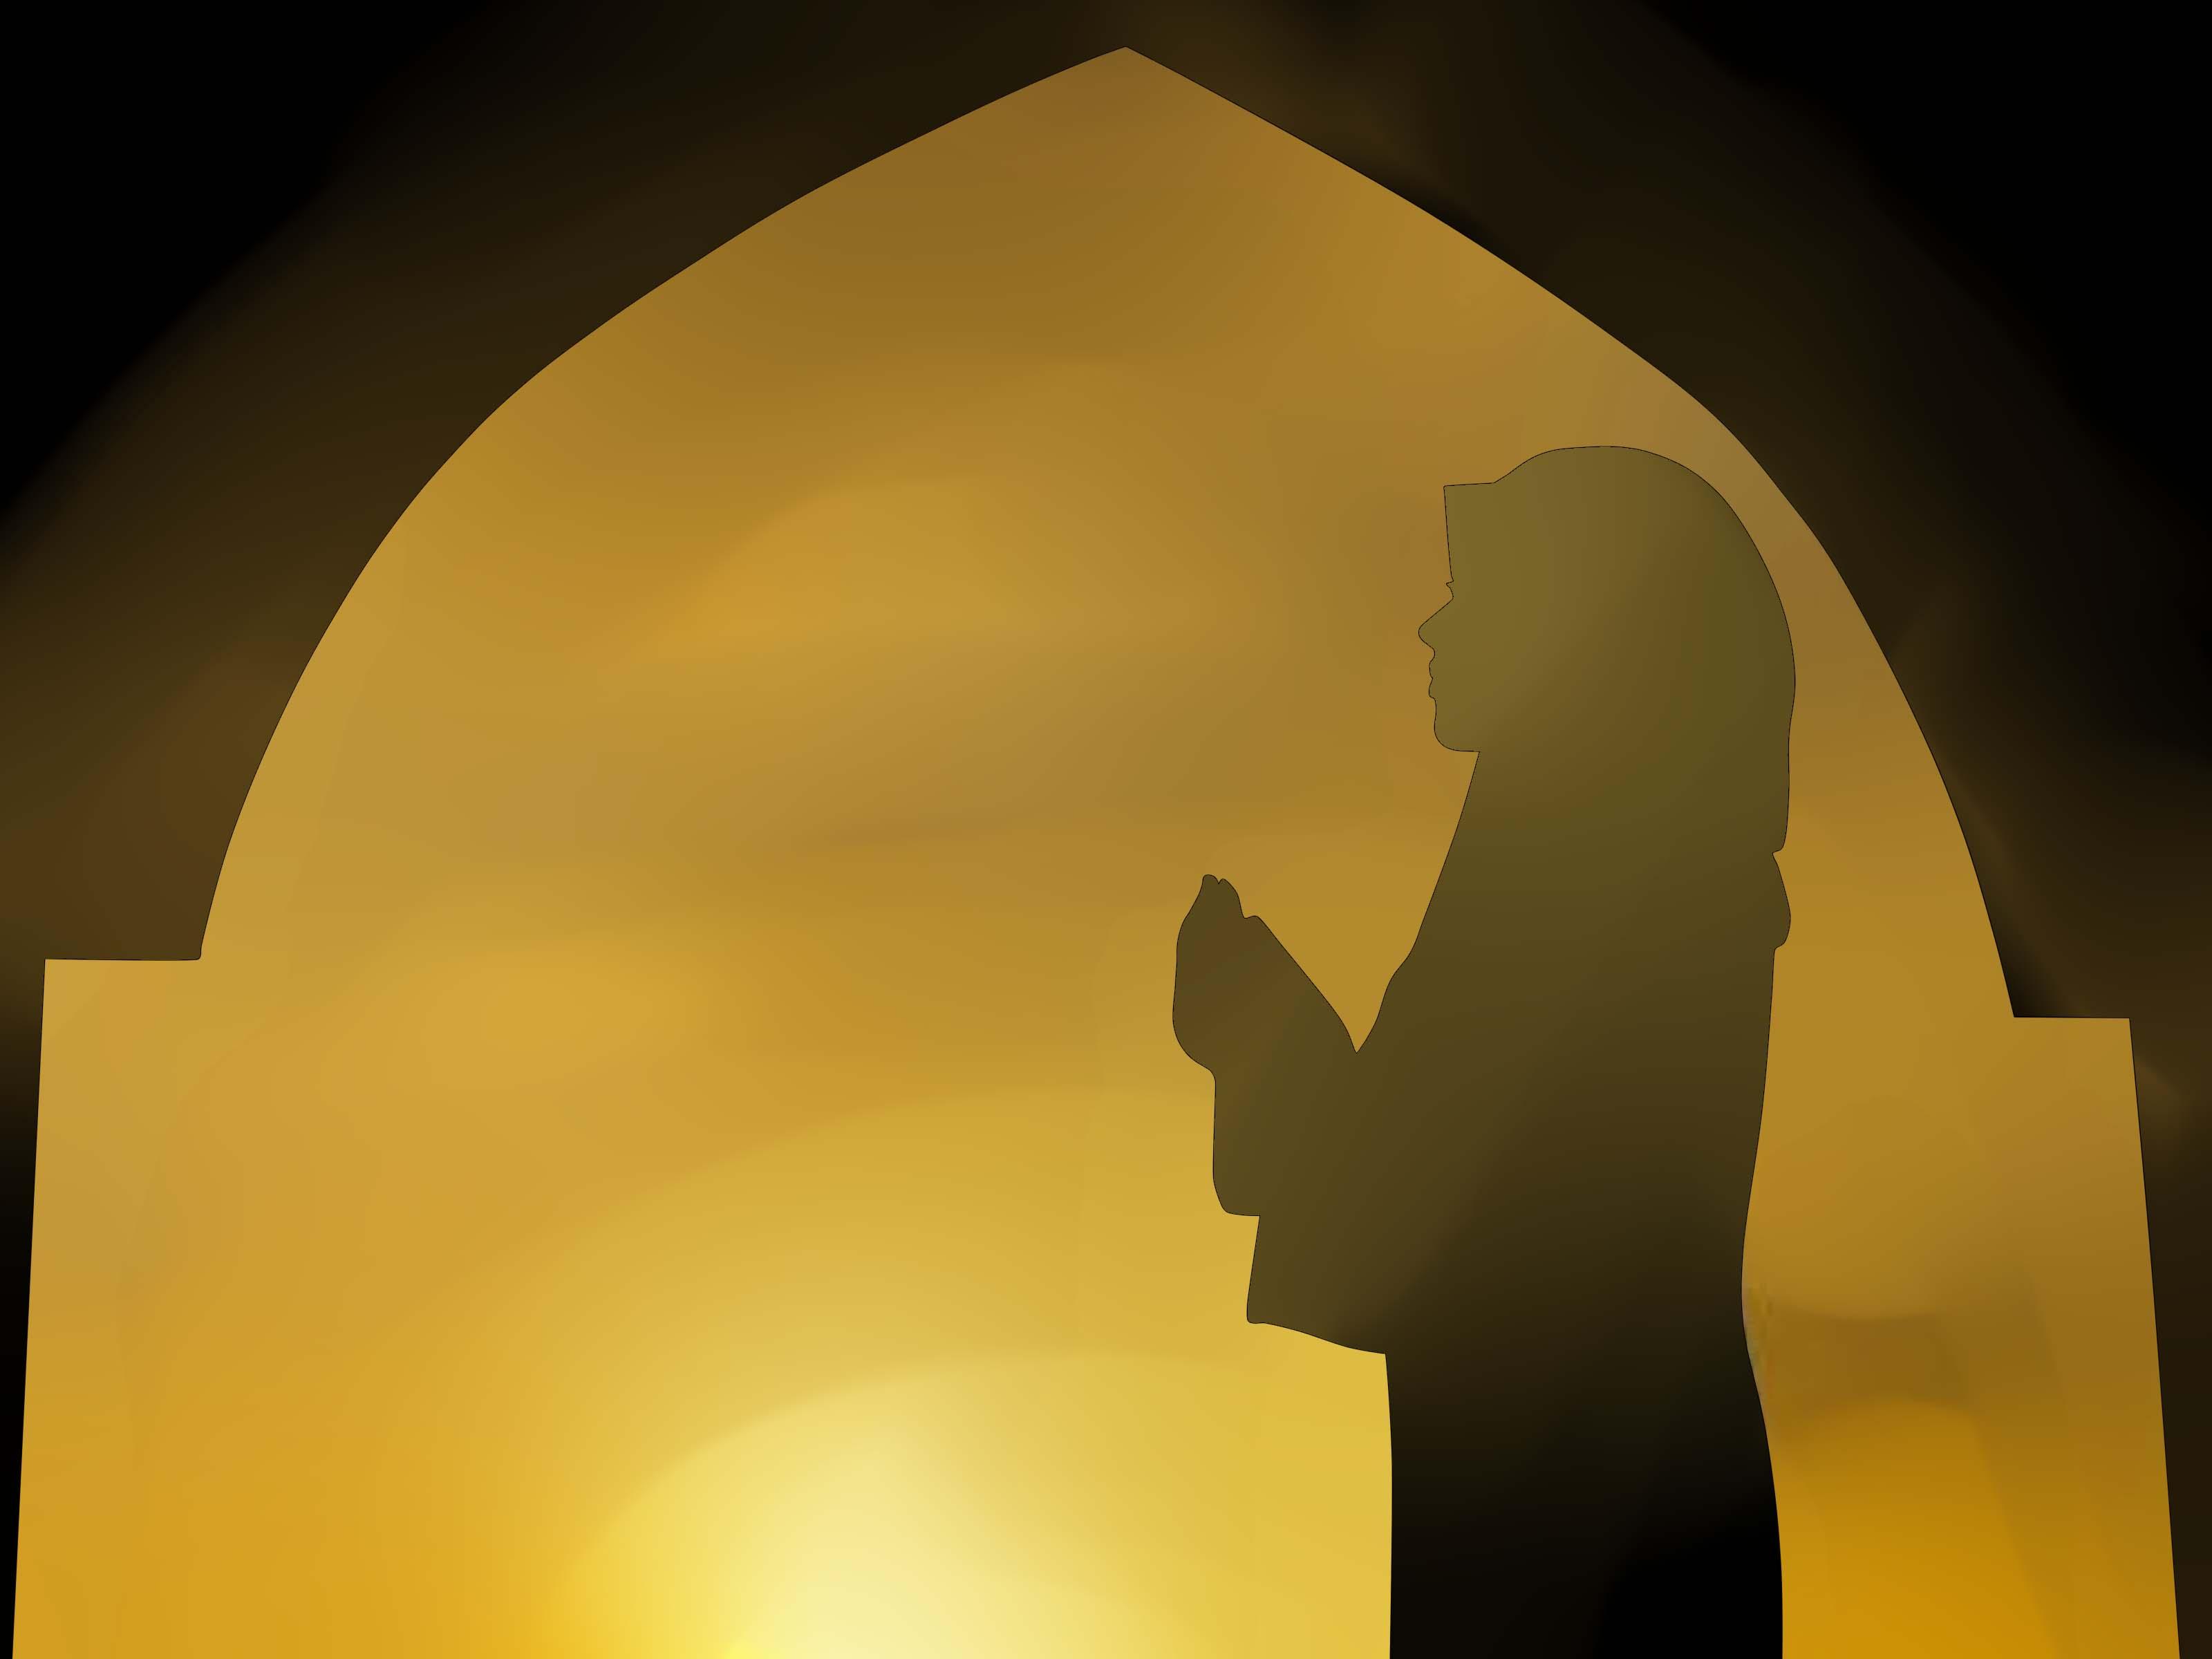 Muslim Girl Namaz Wallpaper Das Tahajjud Gebet Verrichten Wikihow